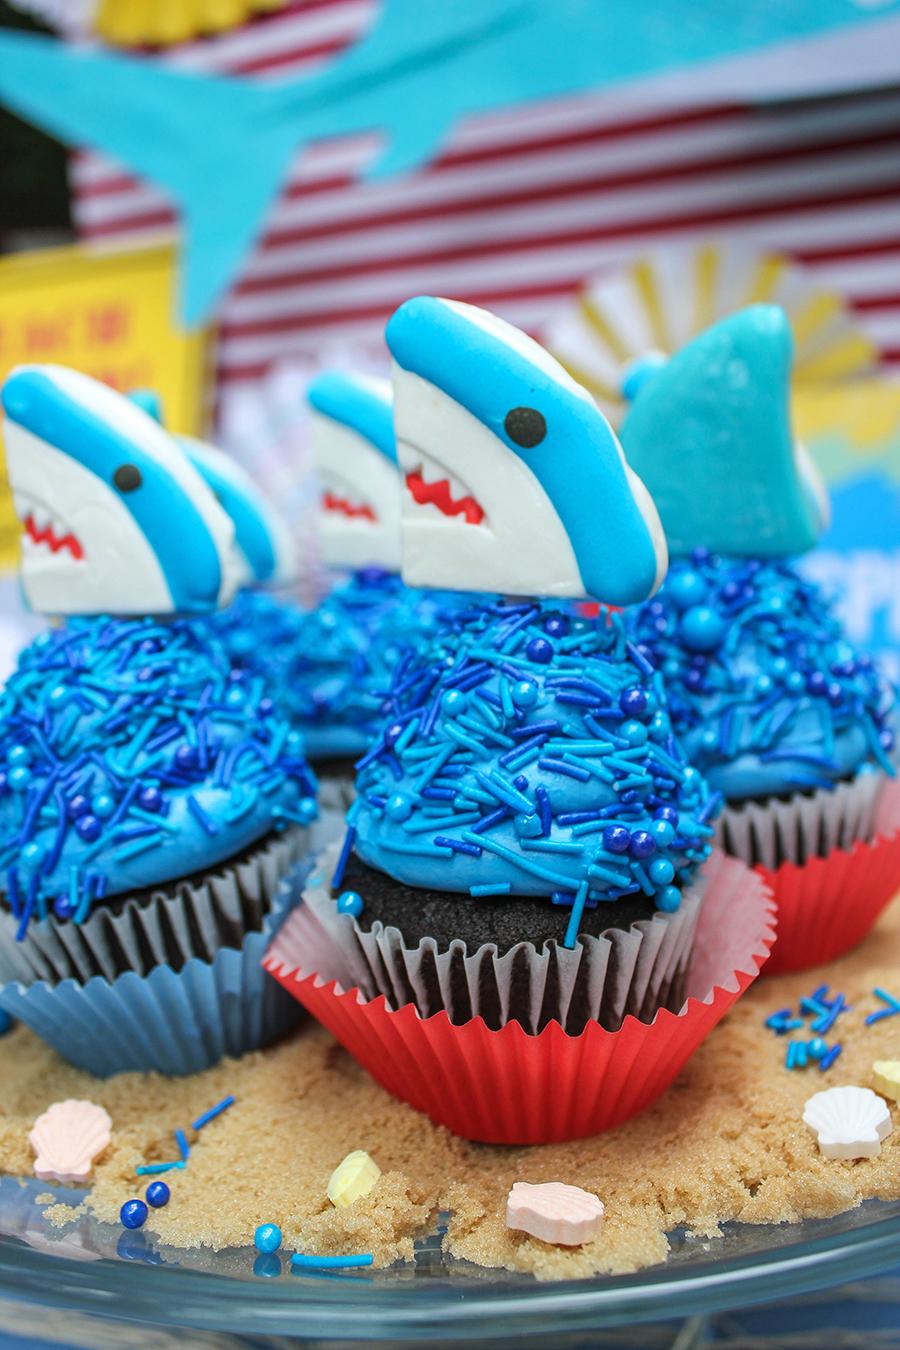 shark party, splash bash, water party, shark waterslide, My Mind's Eye, Just Add Confetti, shark attack, boy party, shark party ideas, shark party decorations, shark party foods, shark party games, jawsome, shark